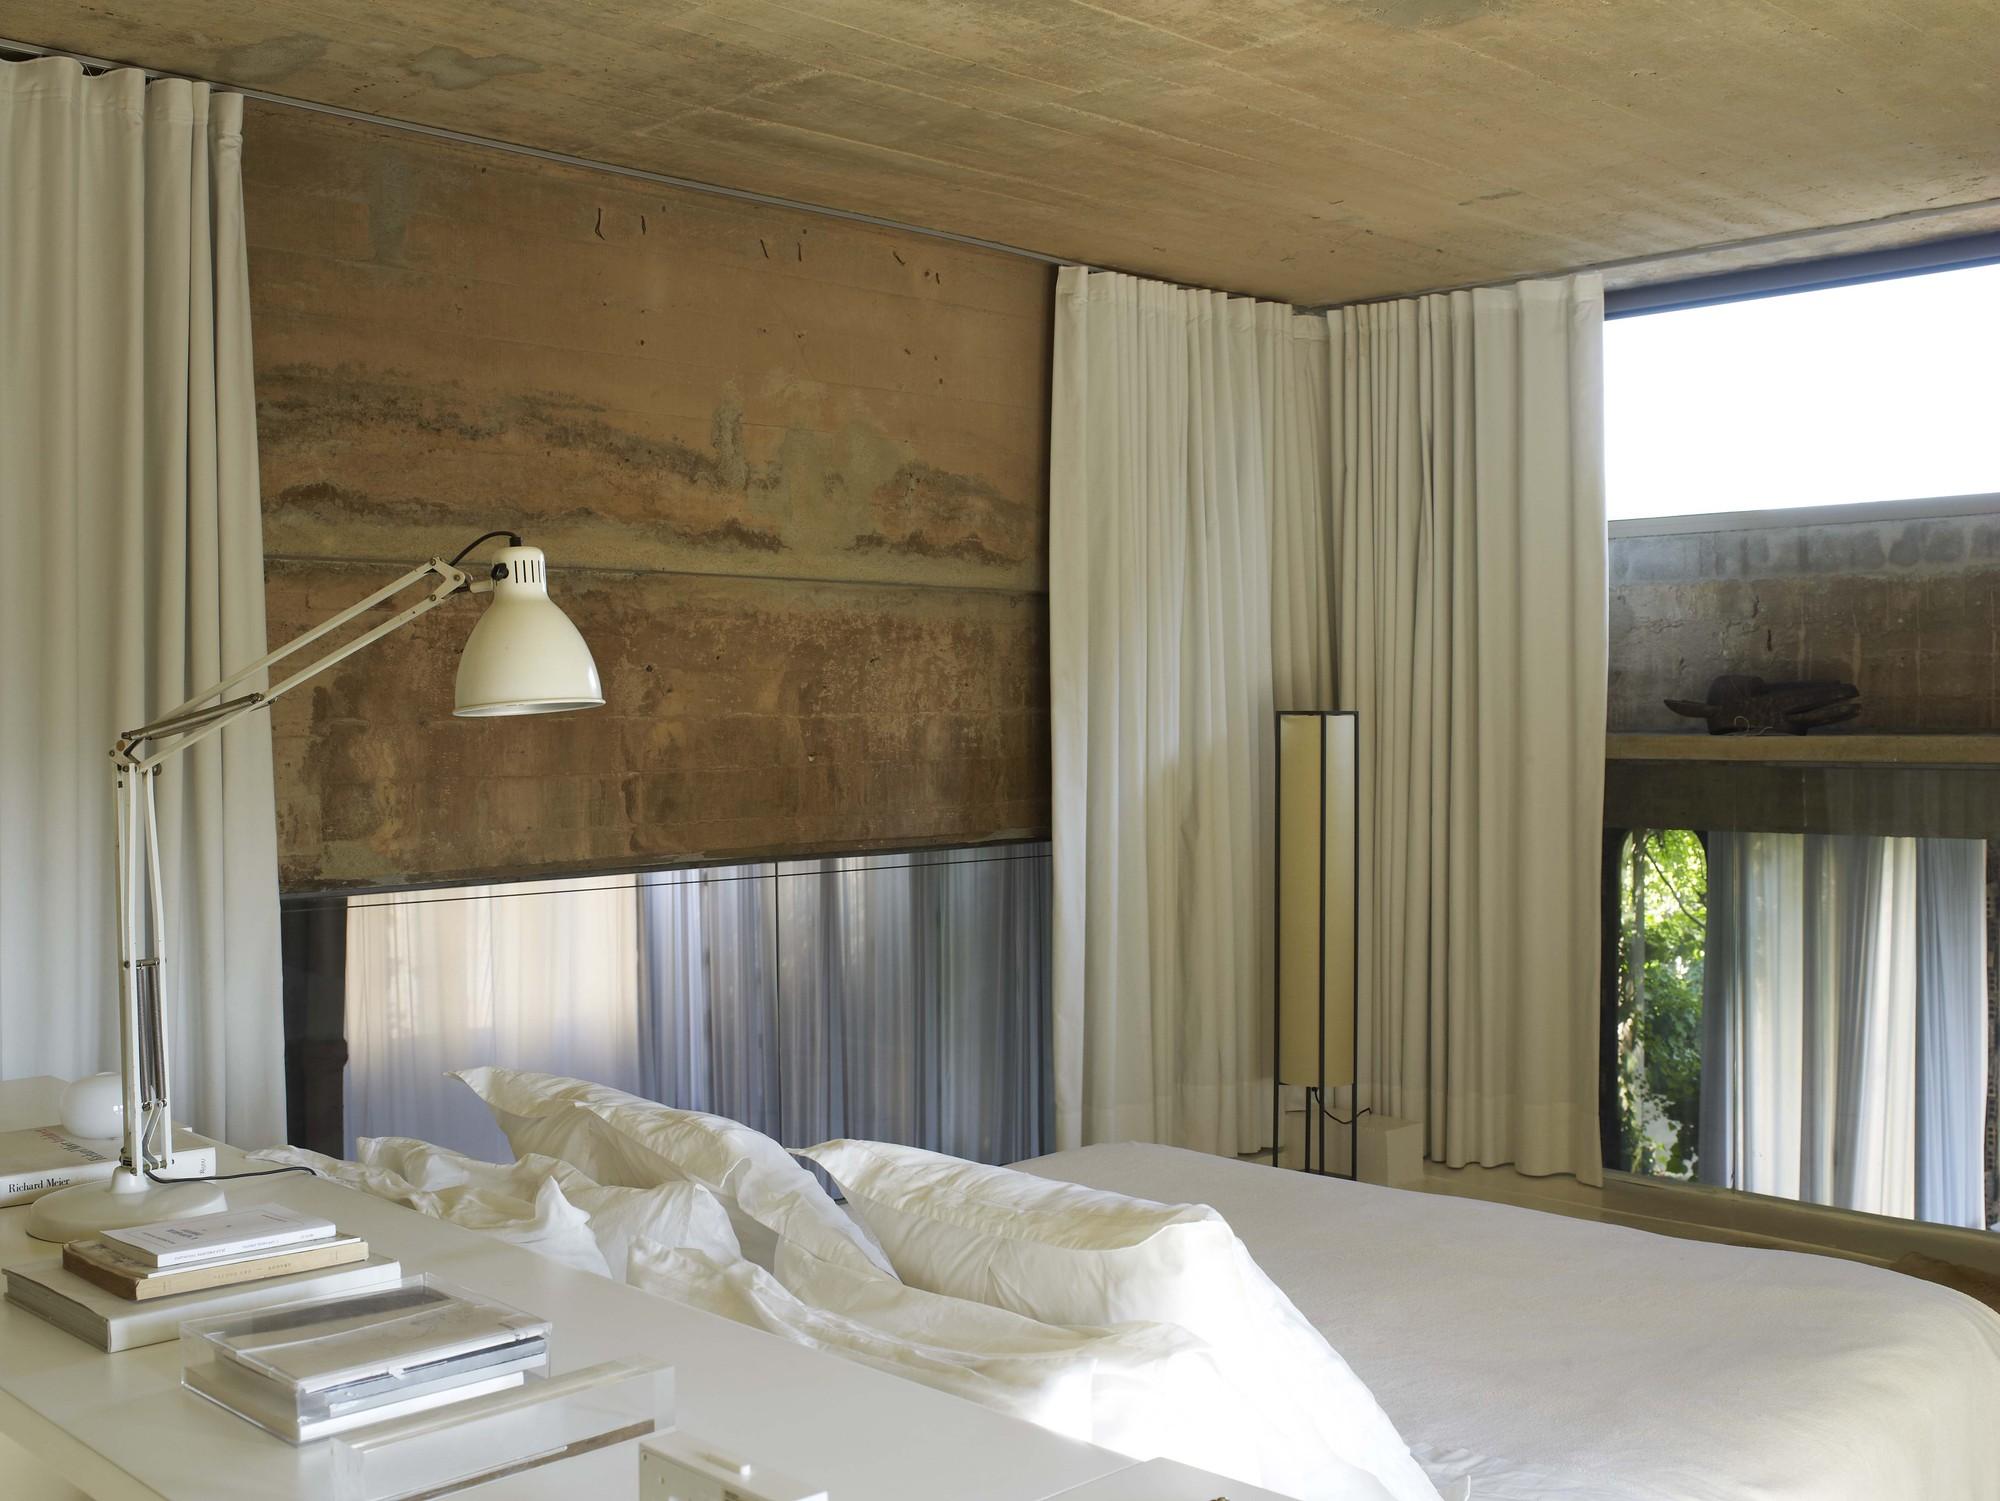 galer a de la f brica ricardo bofill 12. Black Bedroom Furniture Sets. Home Design Ideas